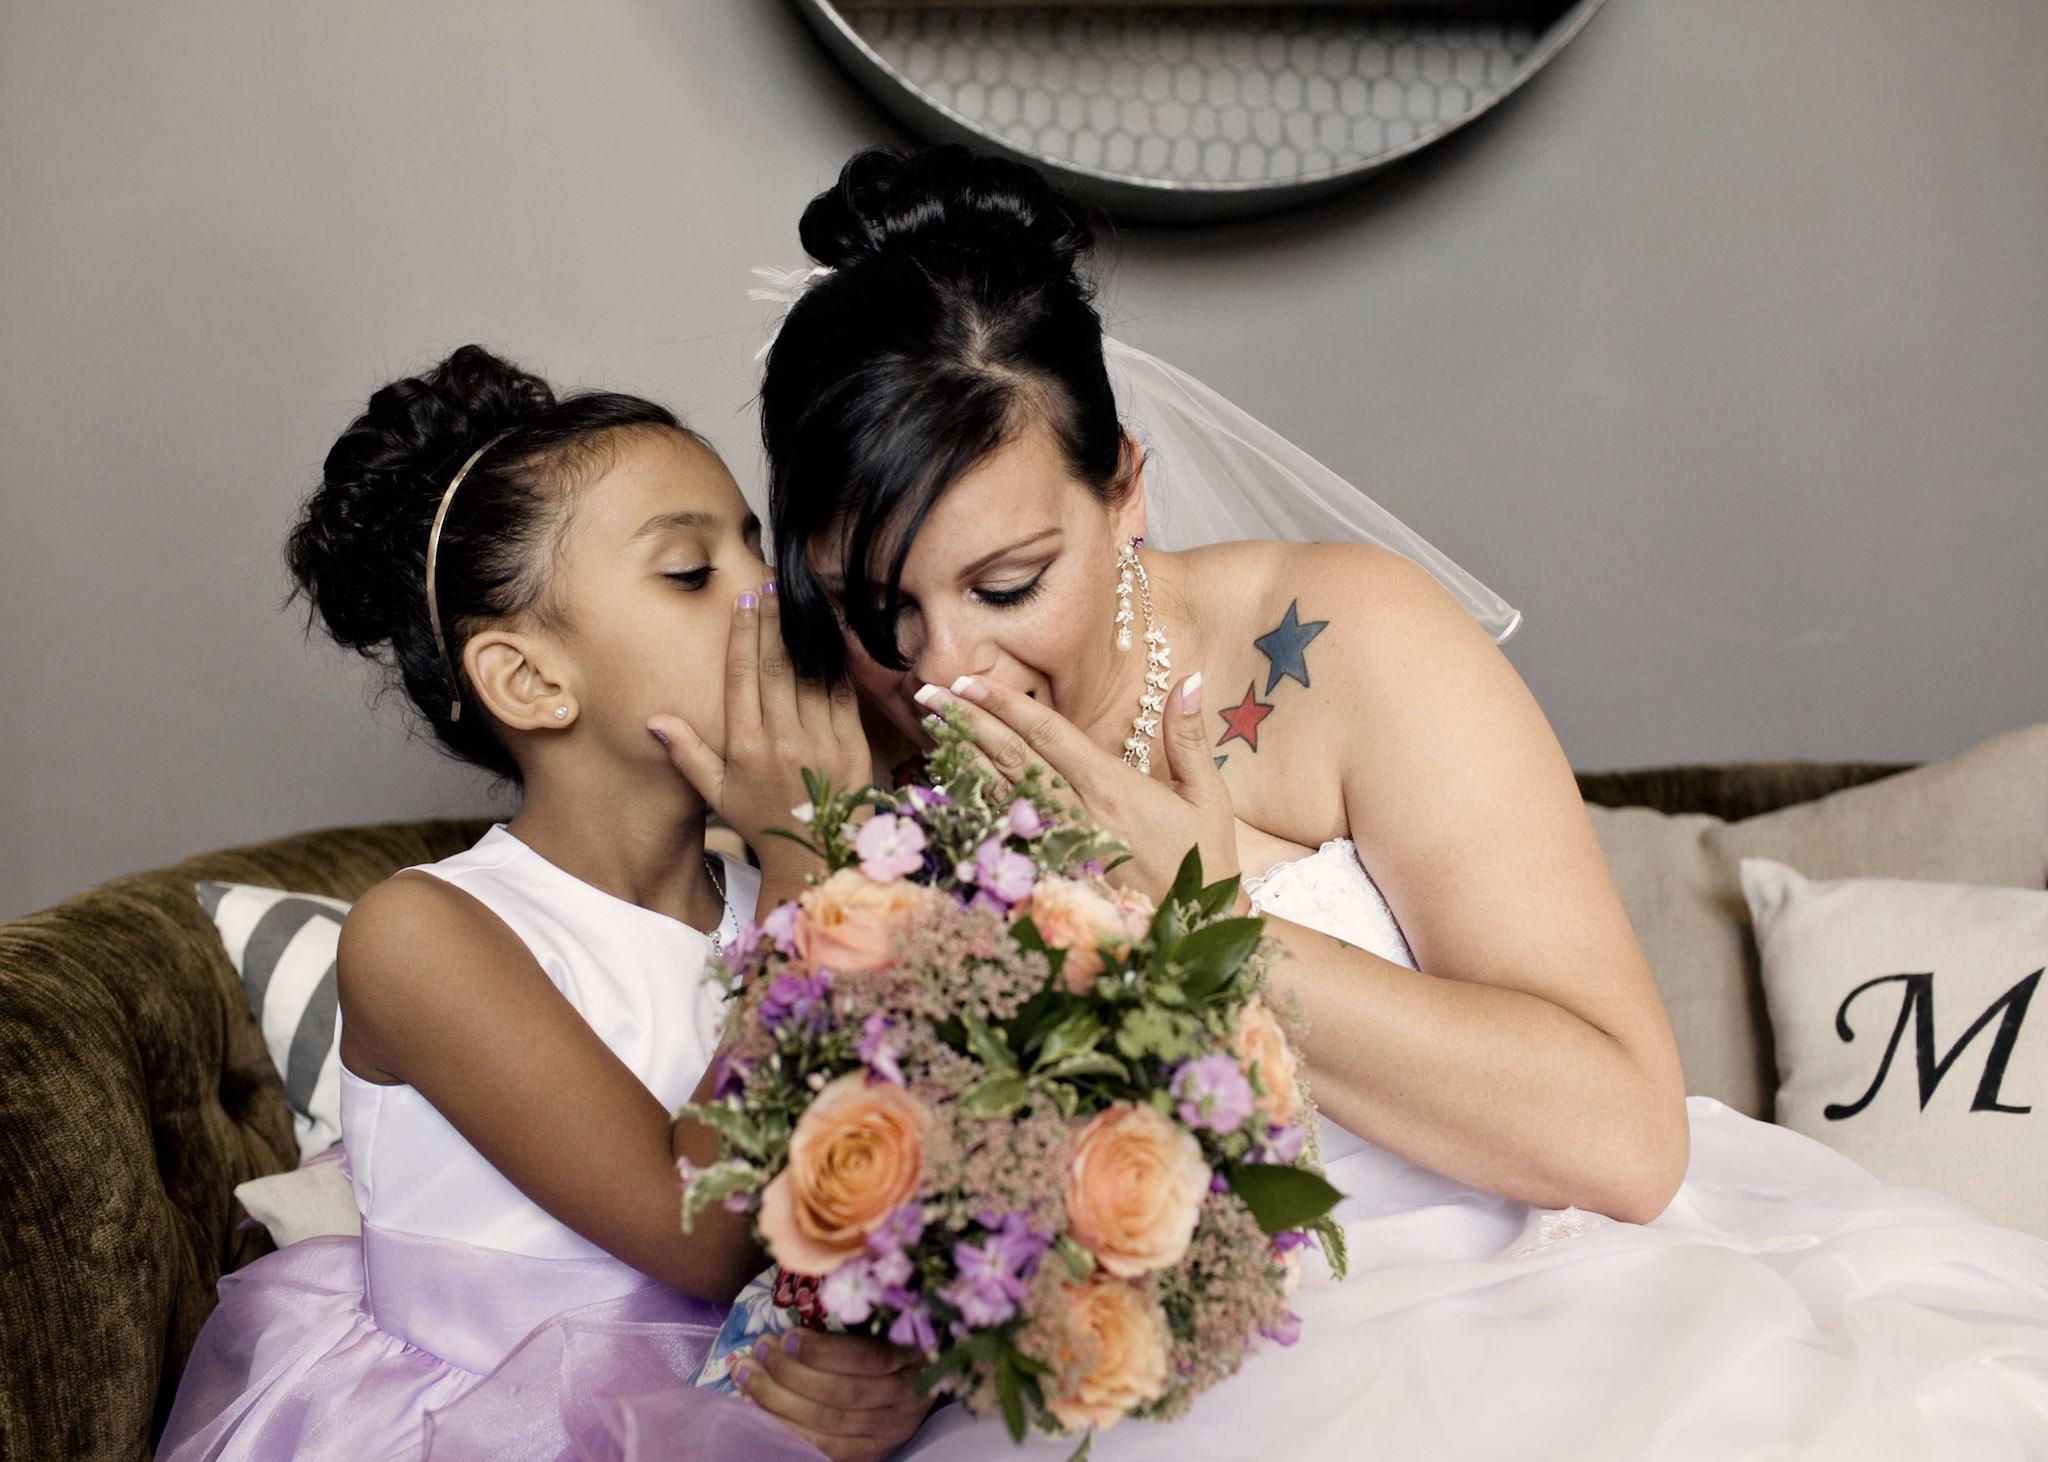 Kansas_City_Small_Wedding_Venue_Elope_Intimate_Ceremony_Budget_Affordable_125M&T.jpg